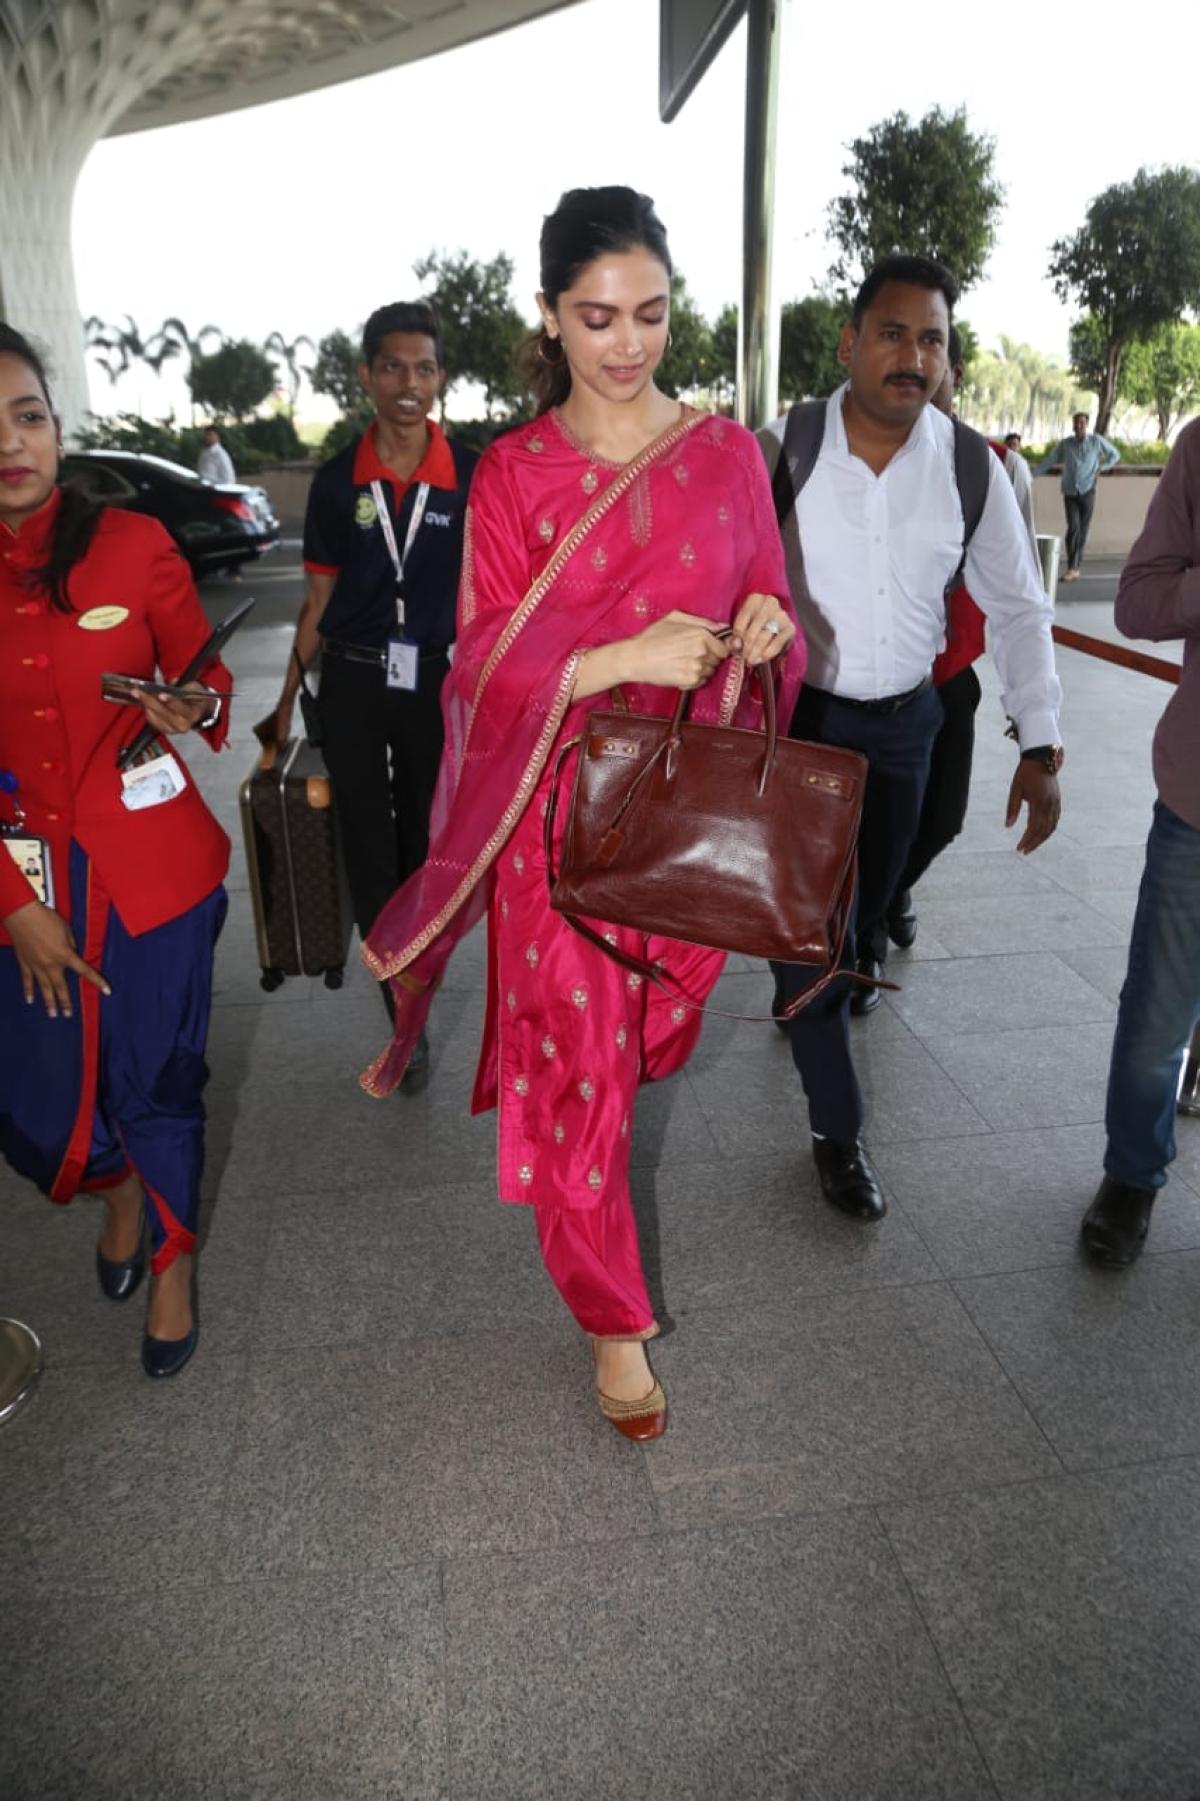 Deepika pairs her royal fuchsia pink salwar suit with Rs 2.7 lakh handbag